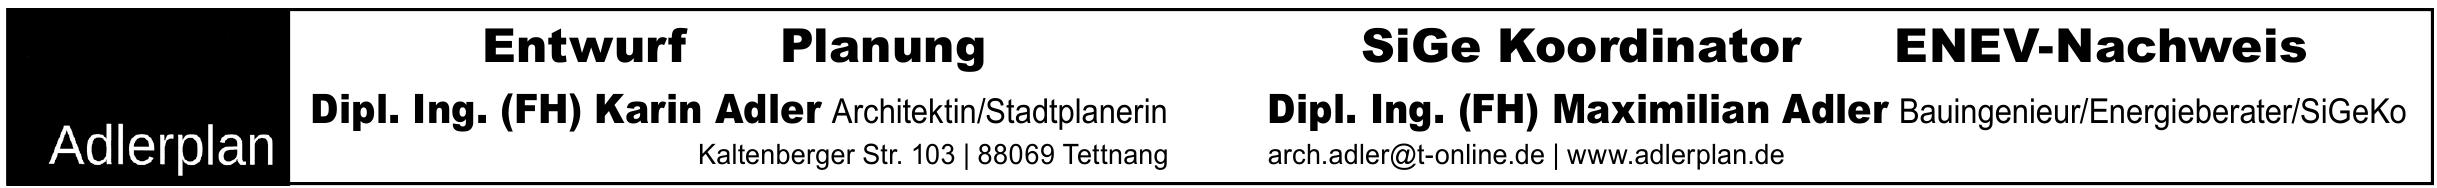 Adlerplan